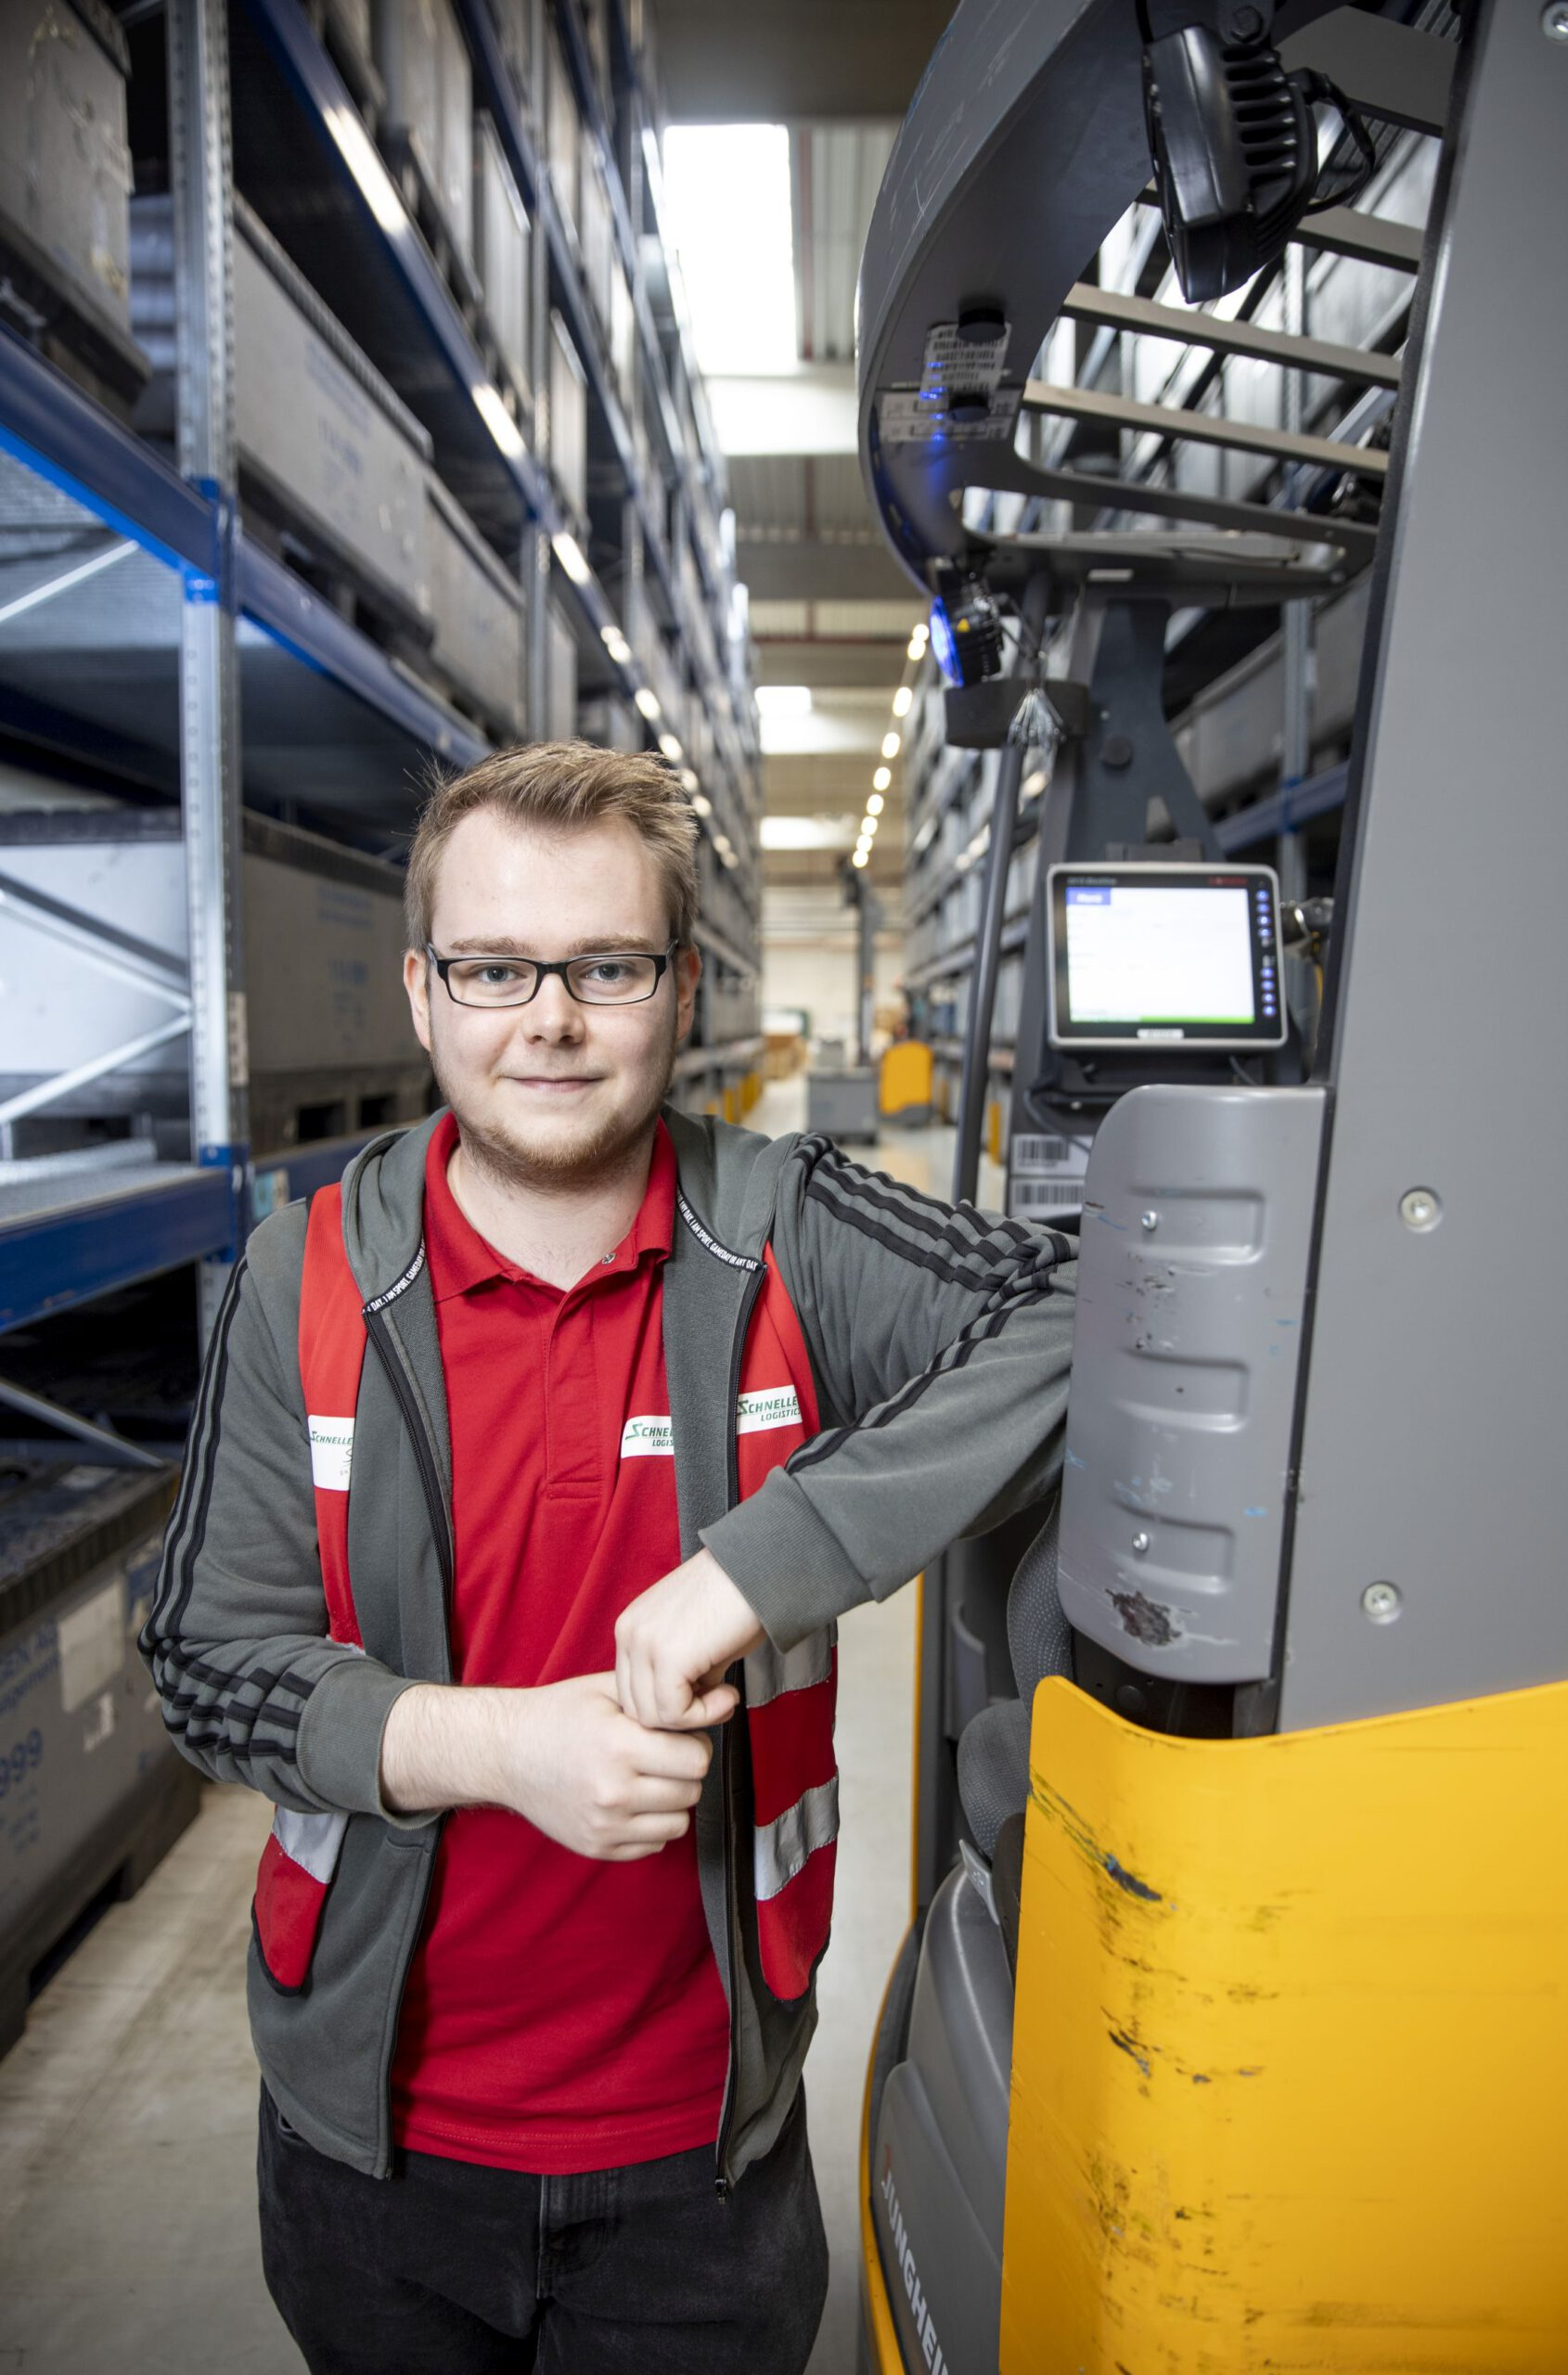 Moin Future IHK Kenny Schieke (23) - Schnellecke Logistics Soltau